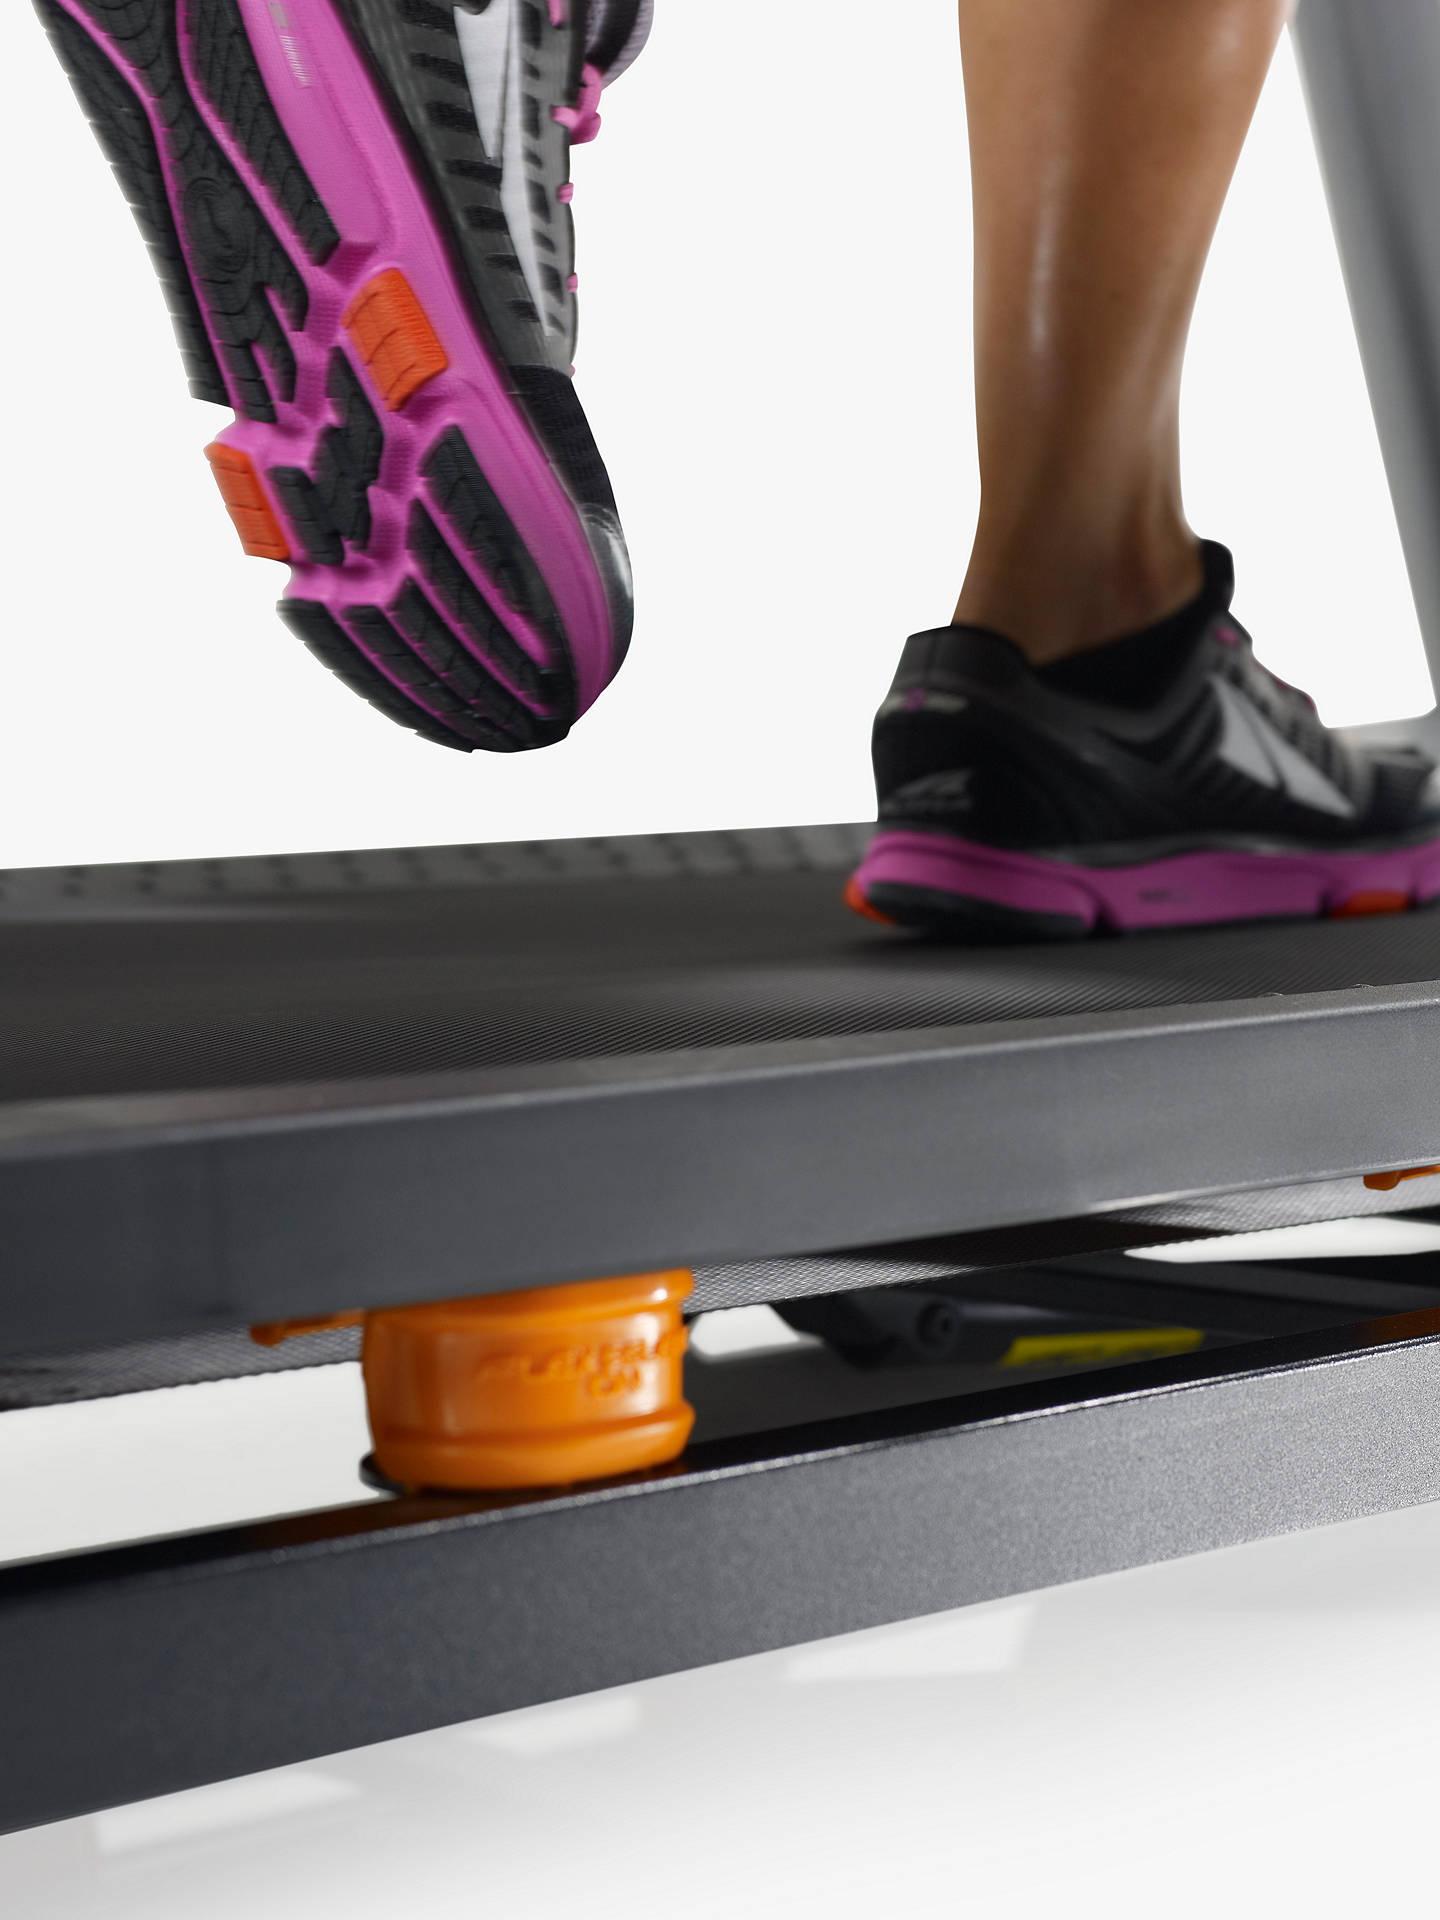 NordicTrack C990 2018 Treadmill